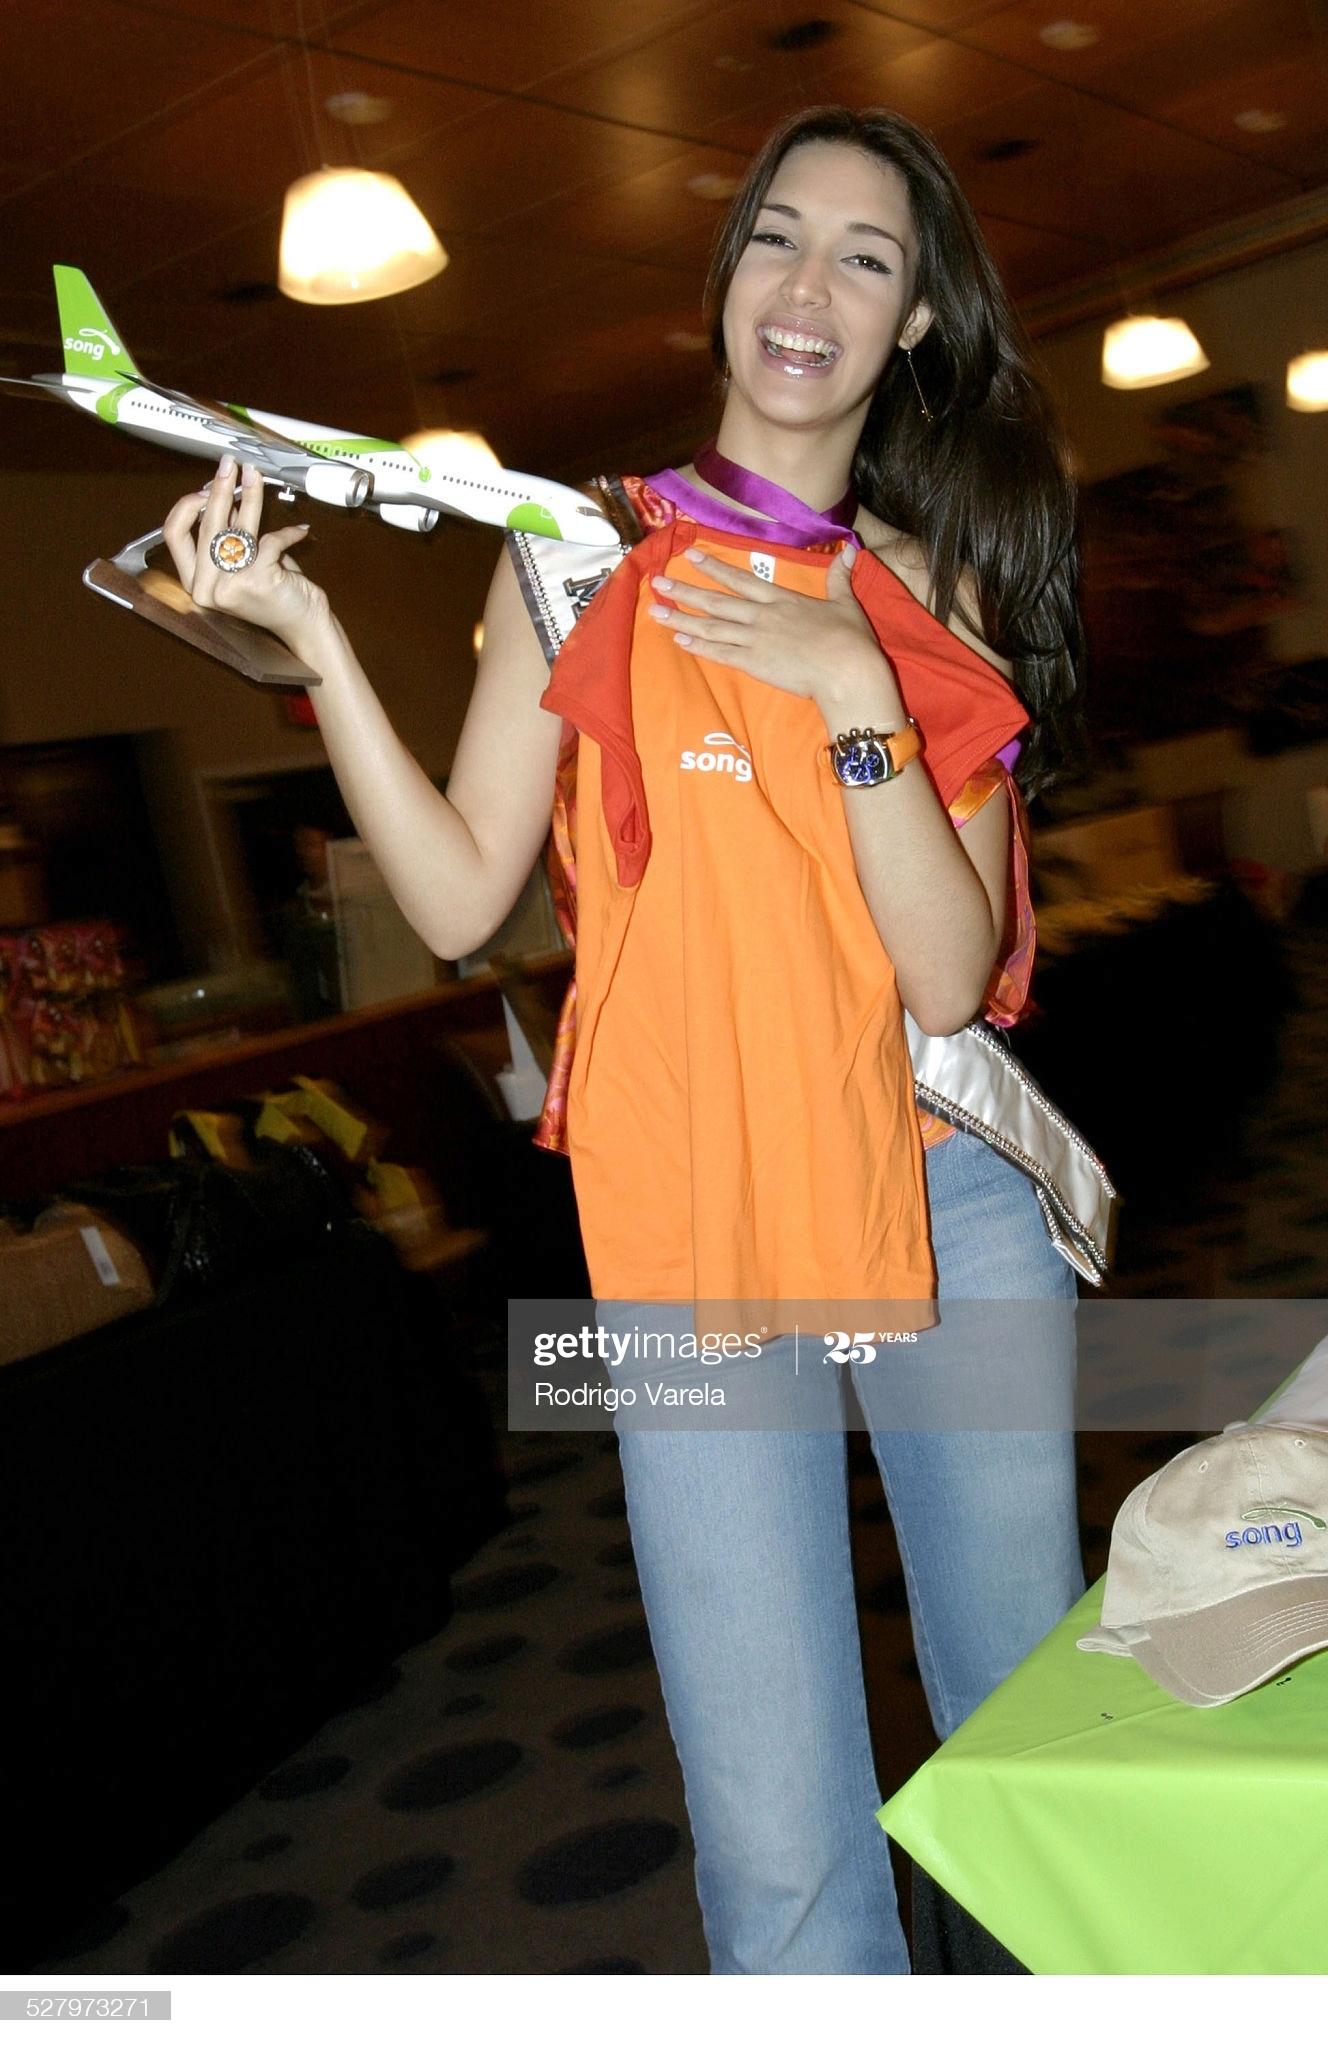 ════ ∘◦❁◦∘ ════ Amelia Vega, Miss Universe 2003. ════ ∘◦❁◦∘ ════ - Página 12 Miss-u55